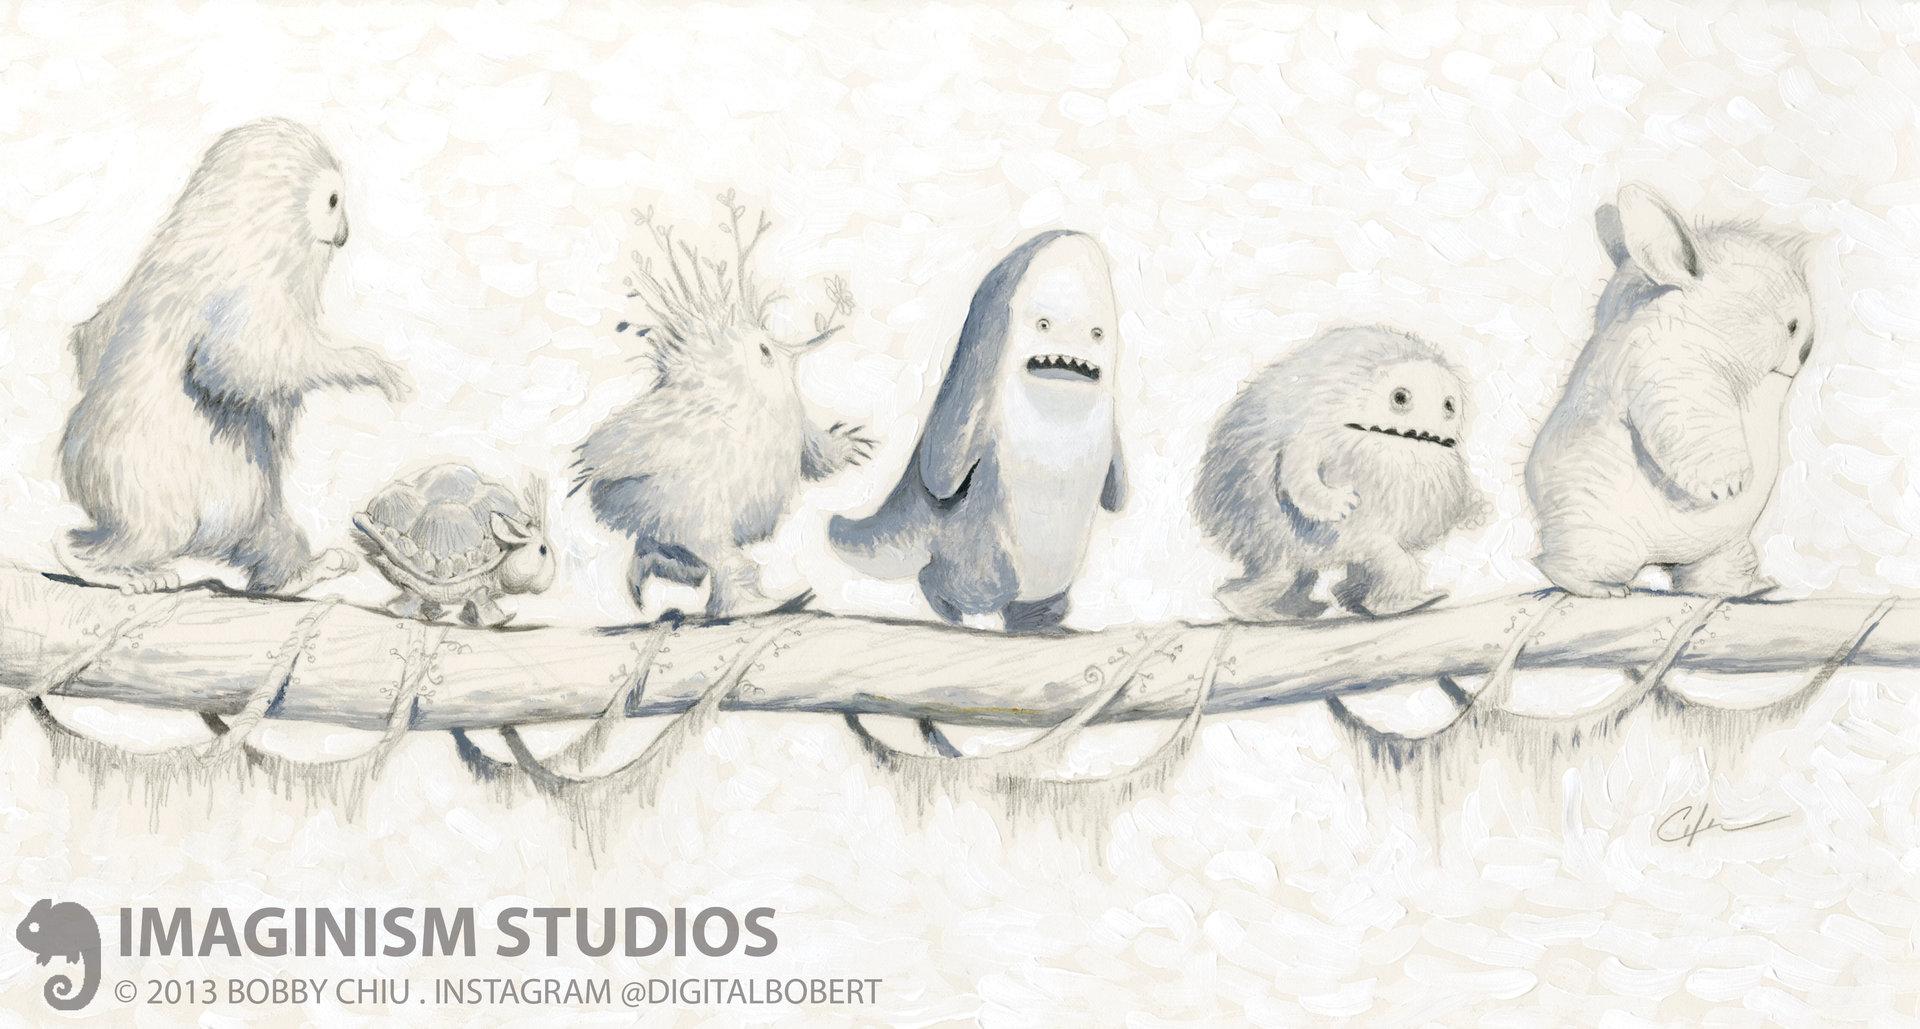 bobby_chiu_fablehatch_digital_artist_illustration_0013.jpg